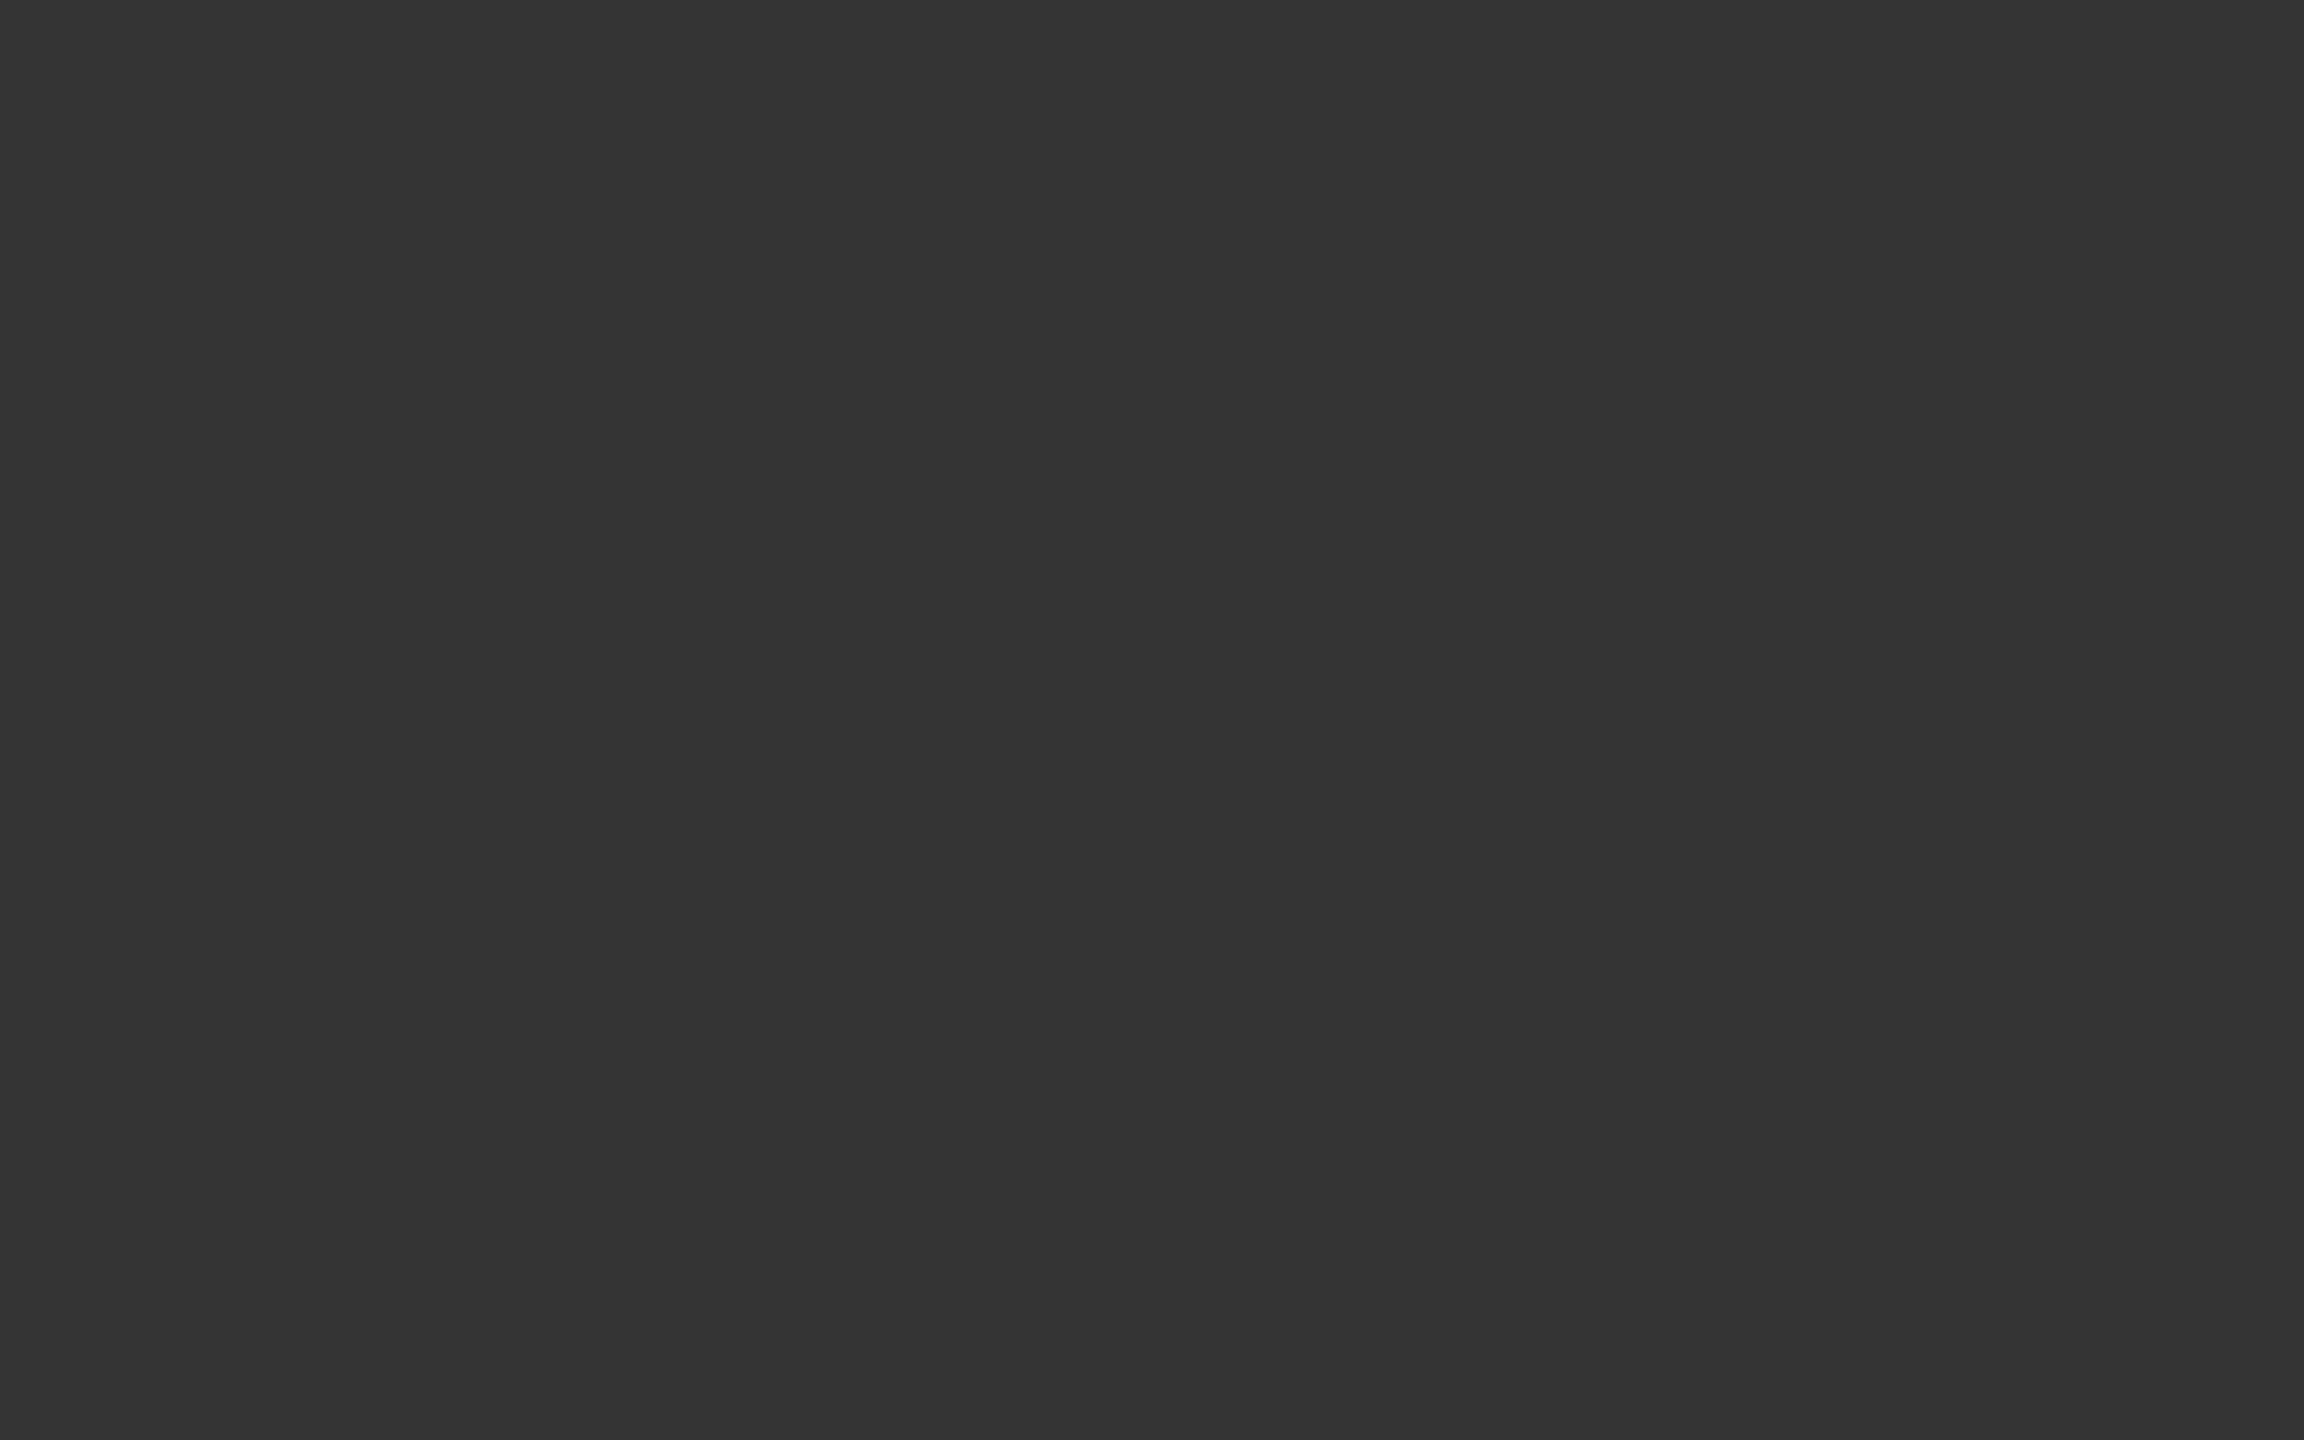 2304x1440 Jet Solid Color Background